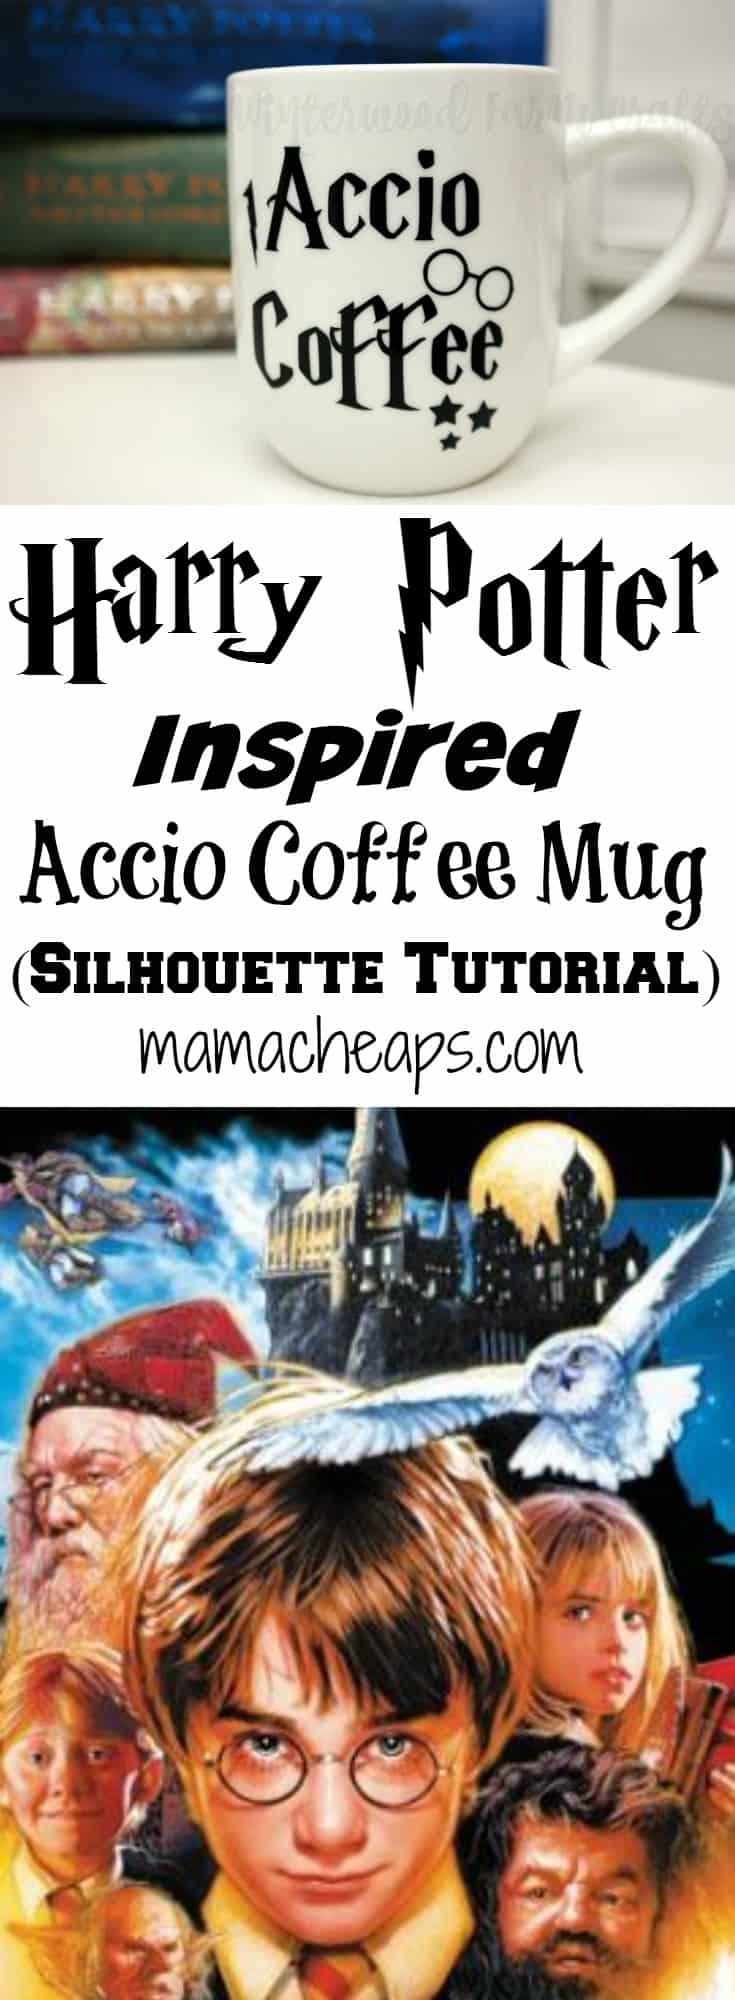 Harry Potter Inspired Accio Coffee Mug